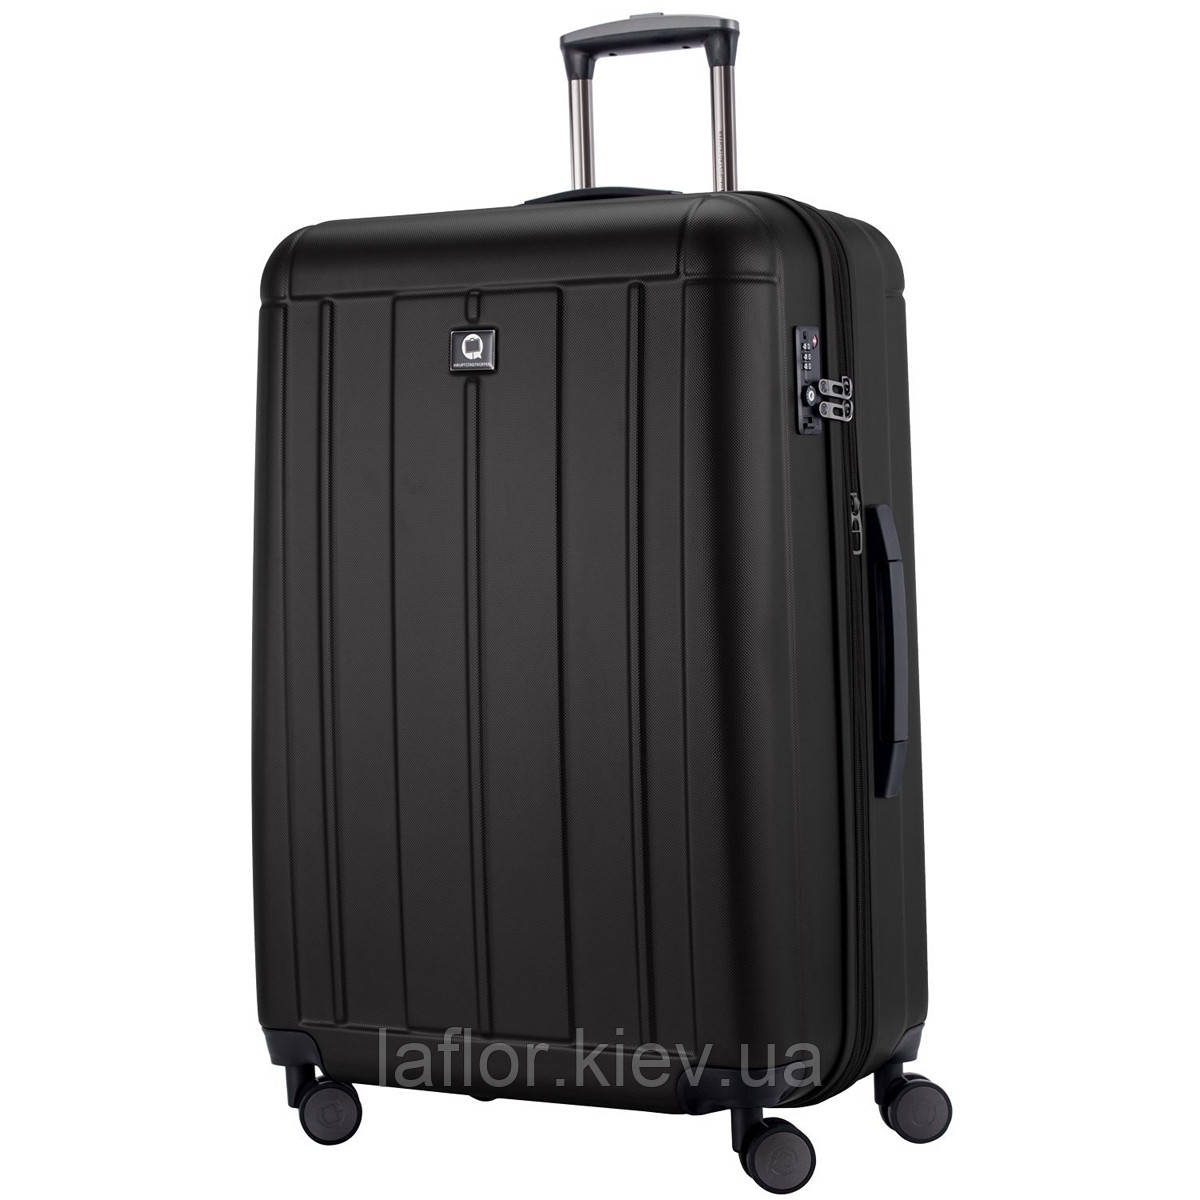 Большие чемоданы Hauptstadtkoffer maxi Kotti черный